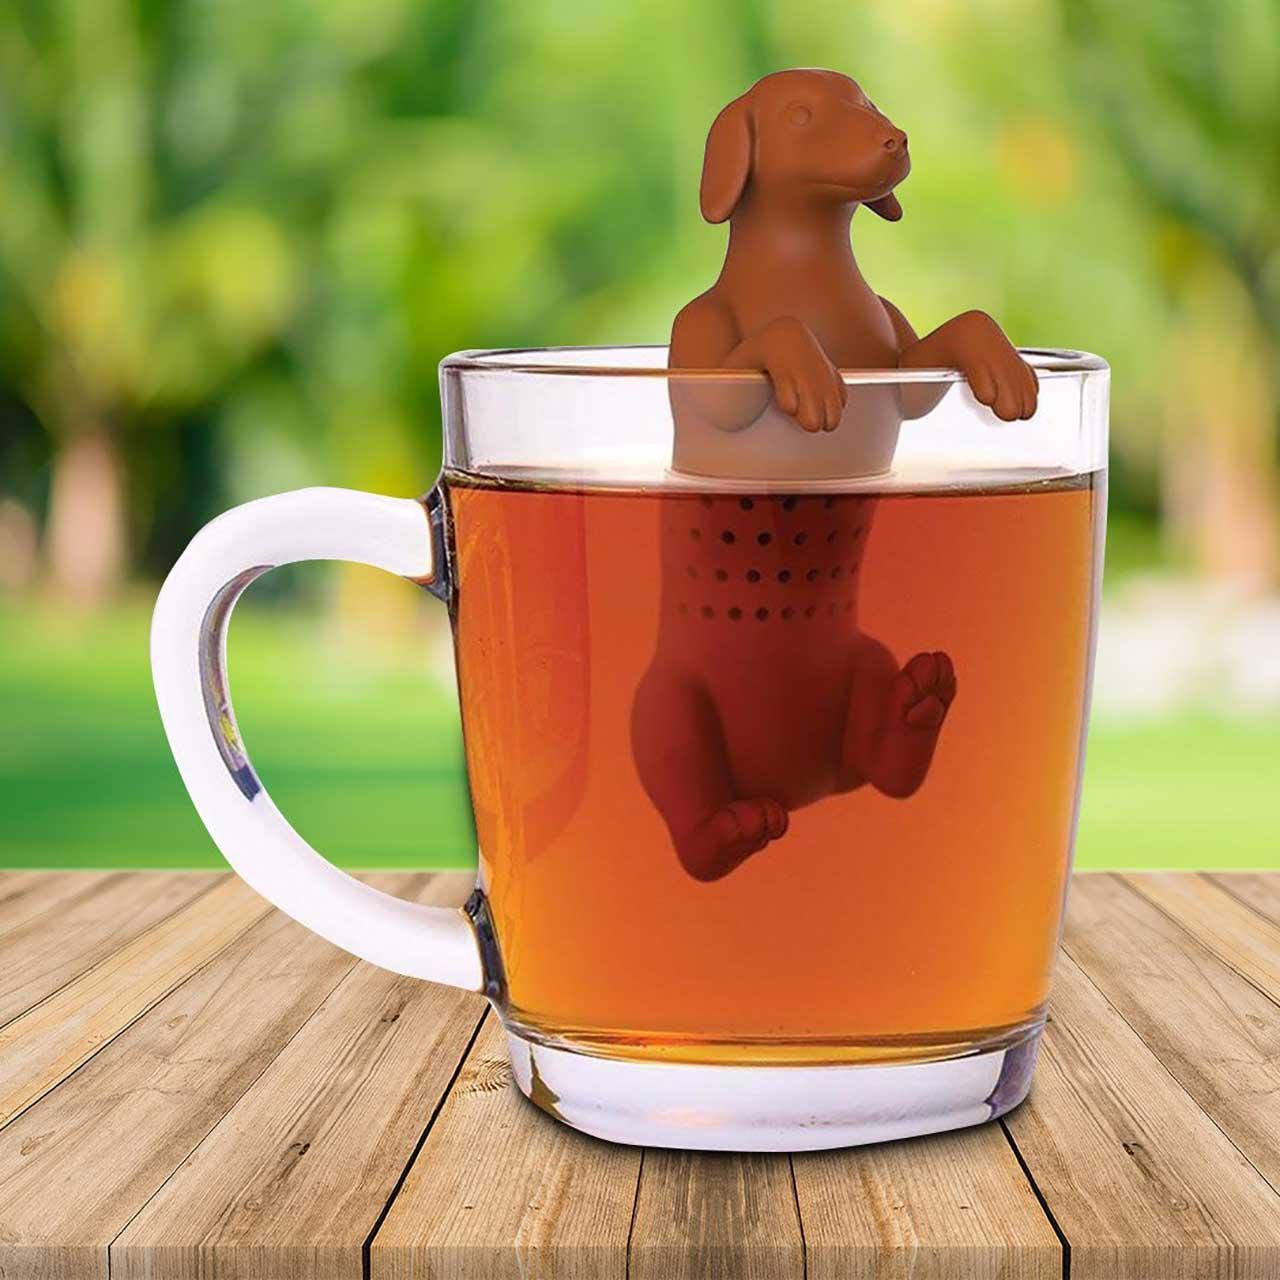 FRED Hot Dog Dachshund Tea Infuser | the design gift shop